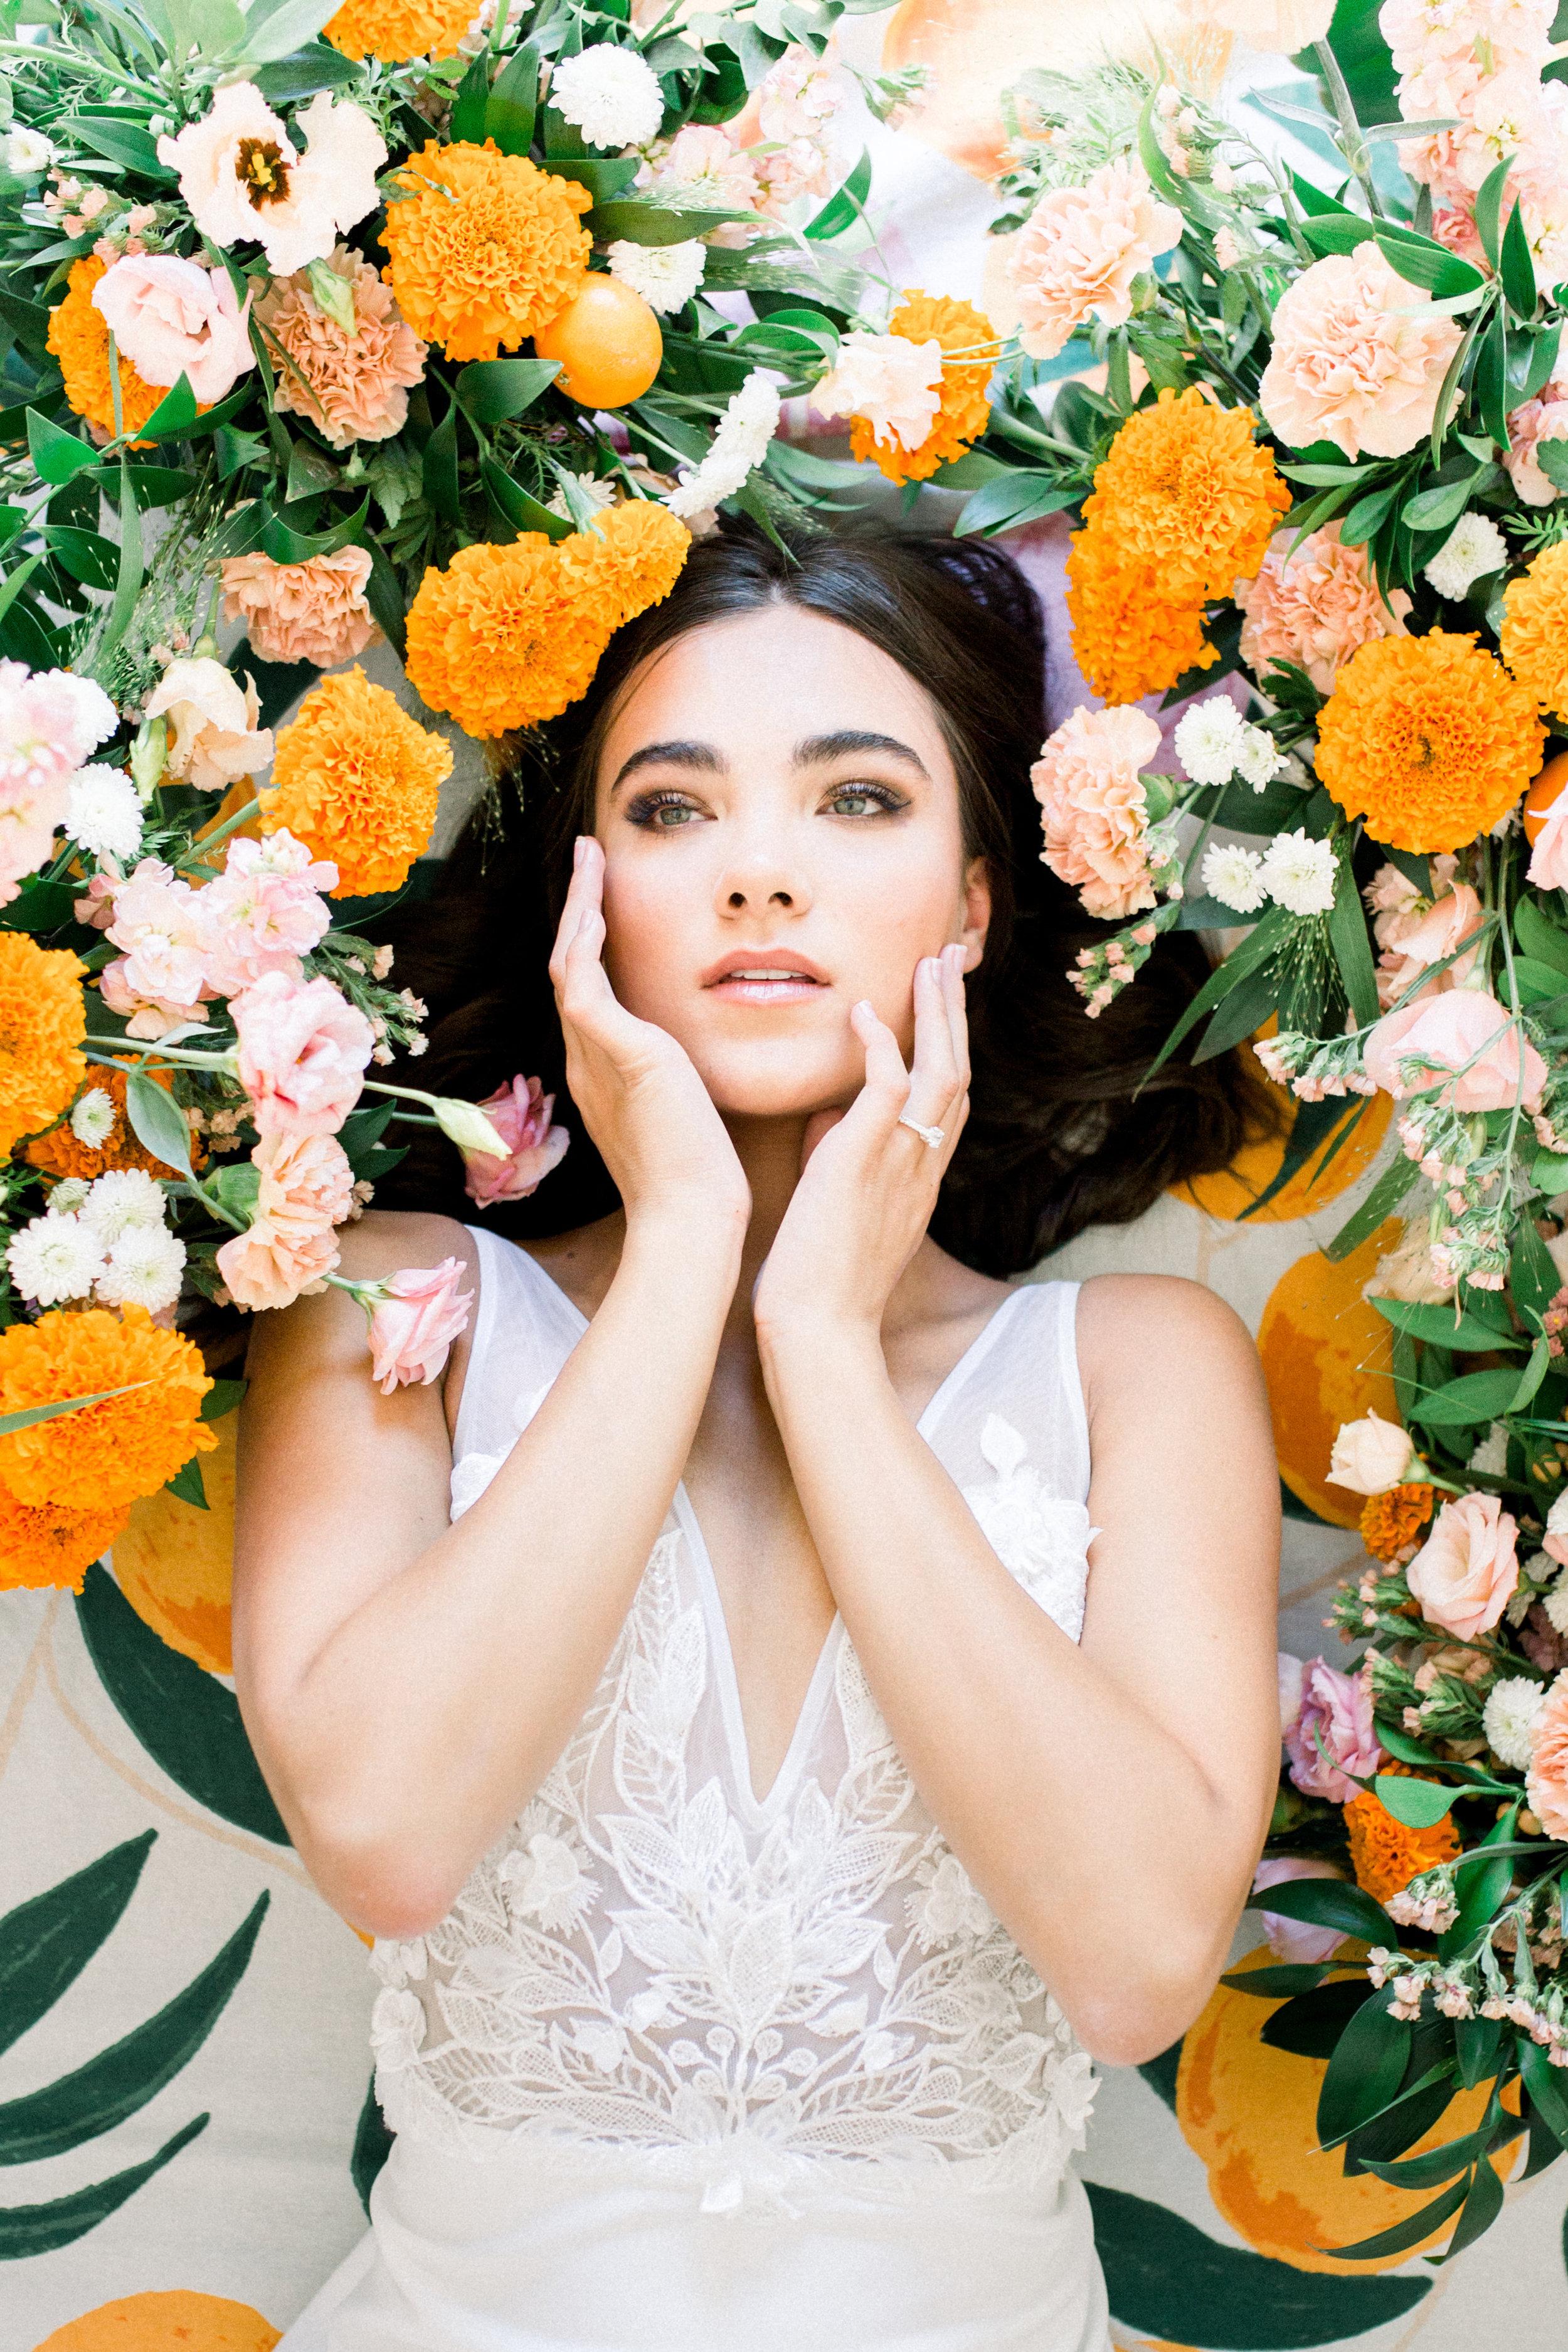 Bridal Gown Lookbook - Arizona florist Phoenix Scottsdale Sedona - Orange and Pink Wedding Inspiration